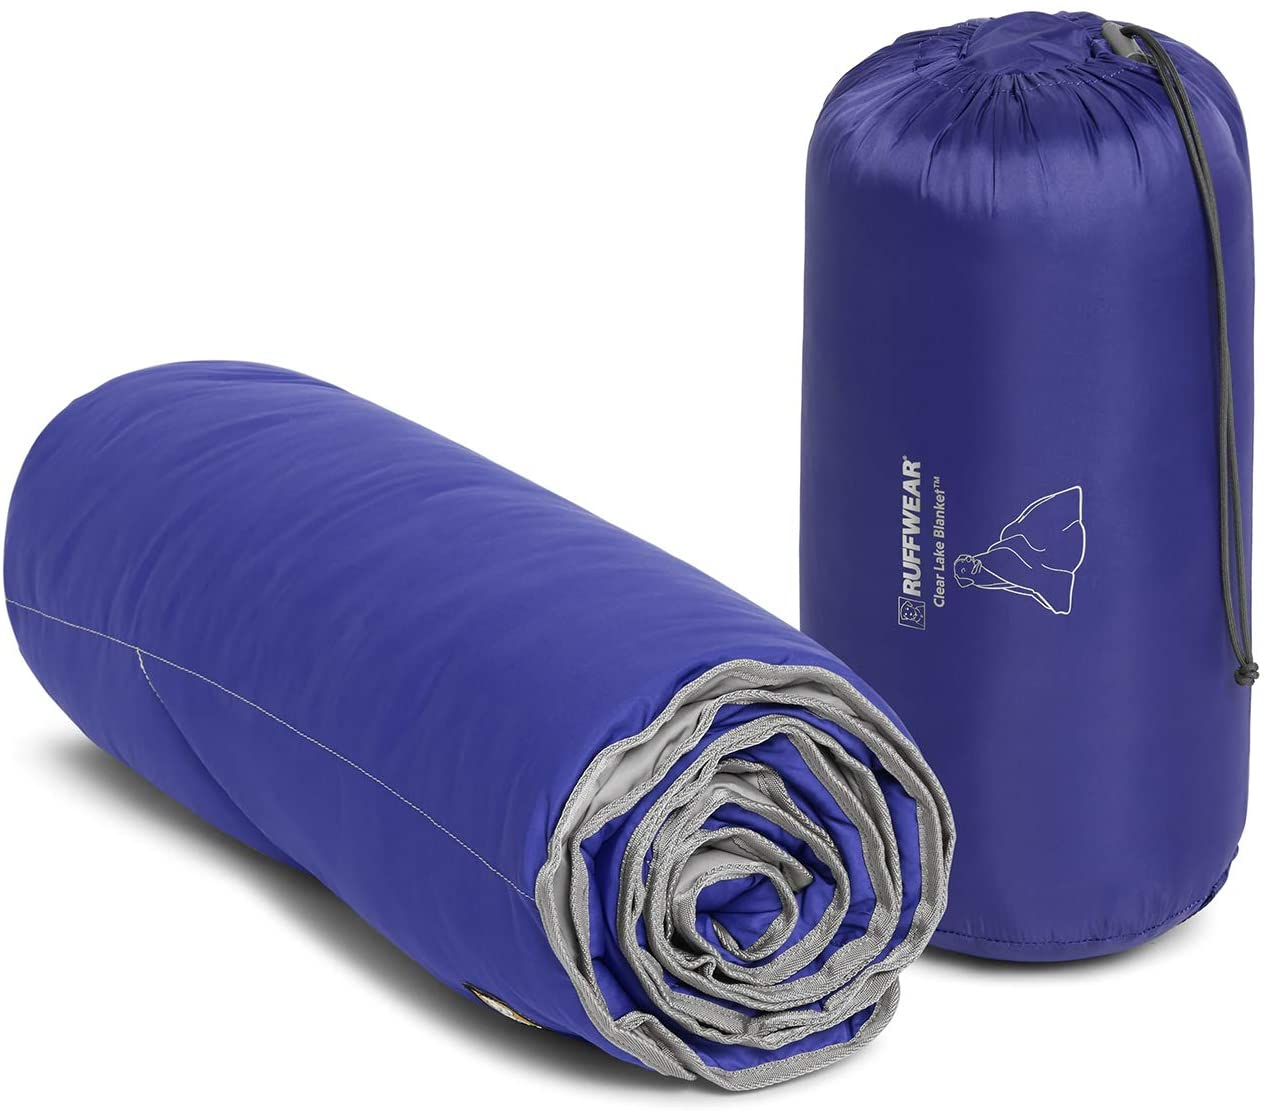 Ruffwear Clear Lake Blanket Huckleberry Blue one size